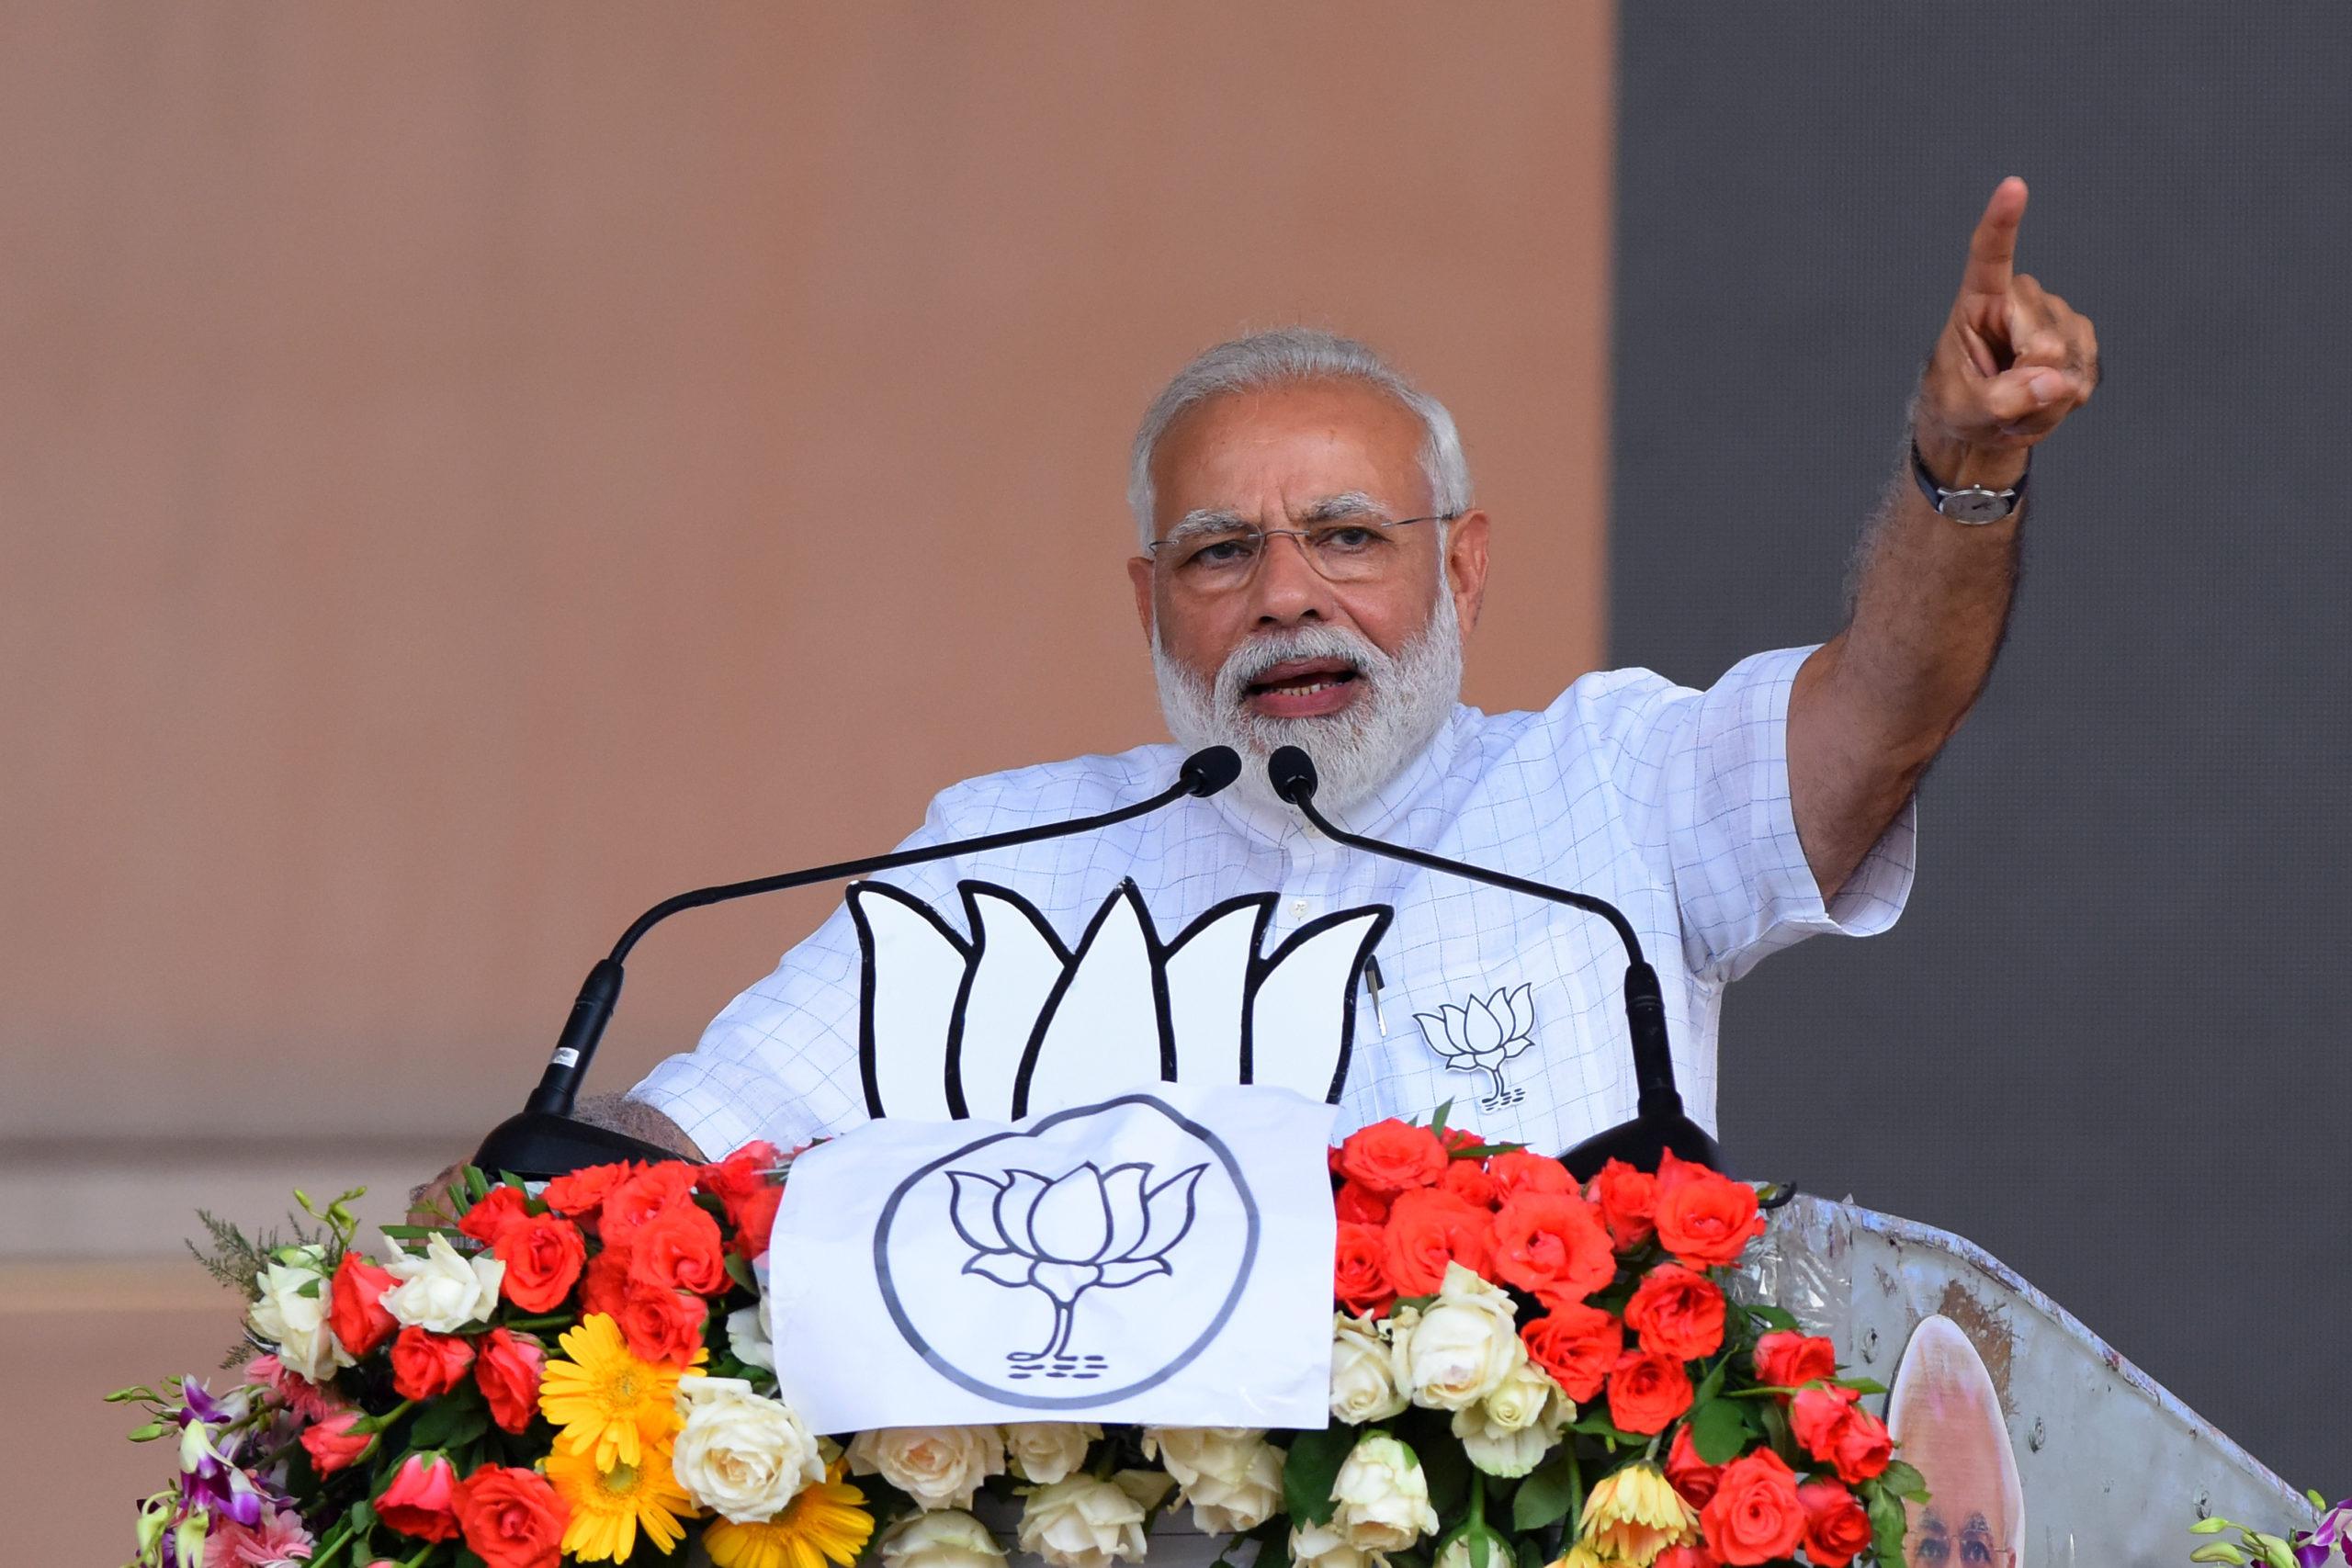 Indiens premiärminister Narendra Modi är hindunationalismens frontfigur.